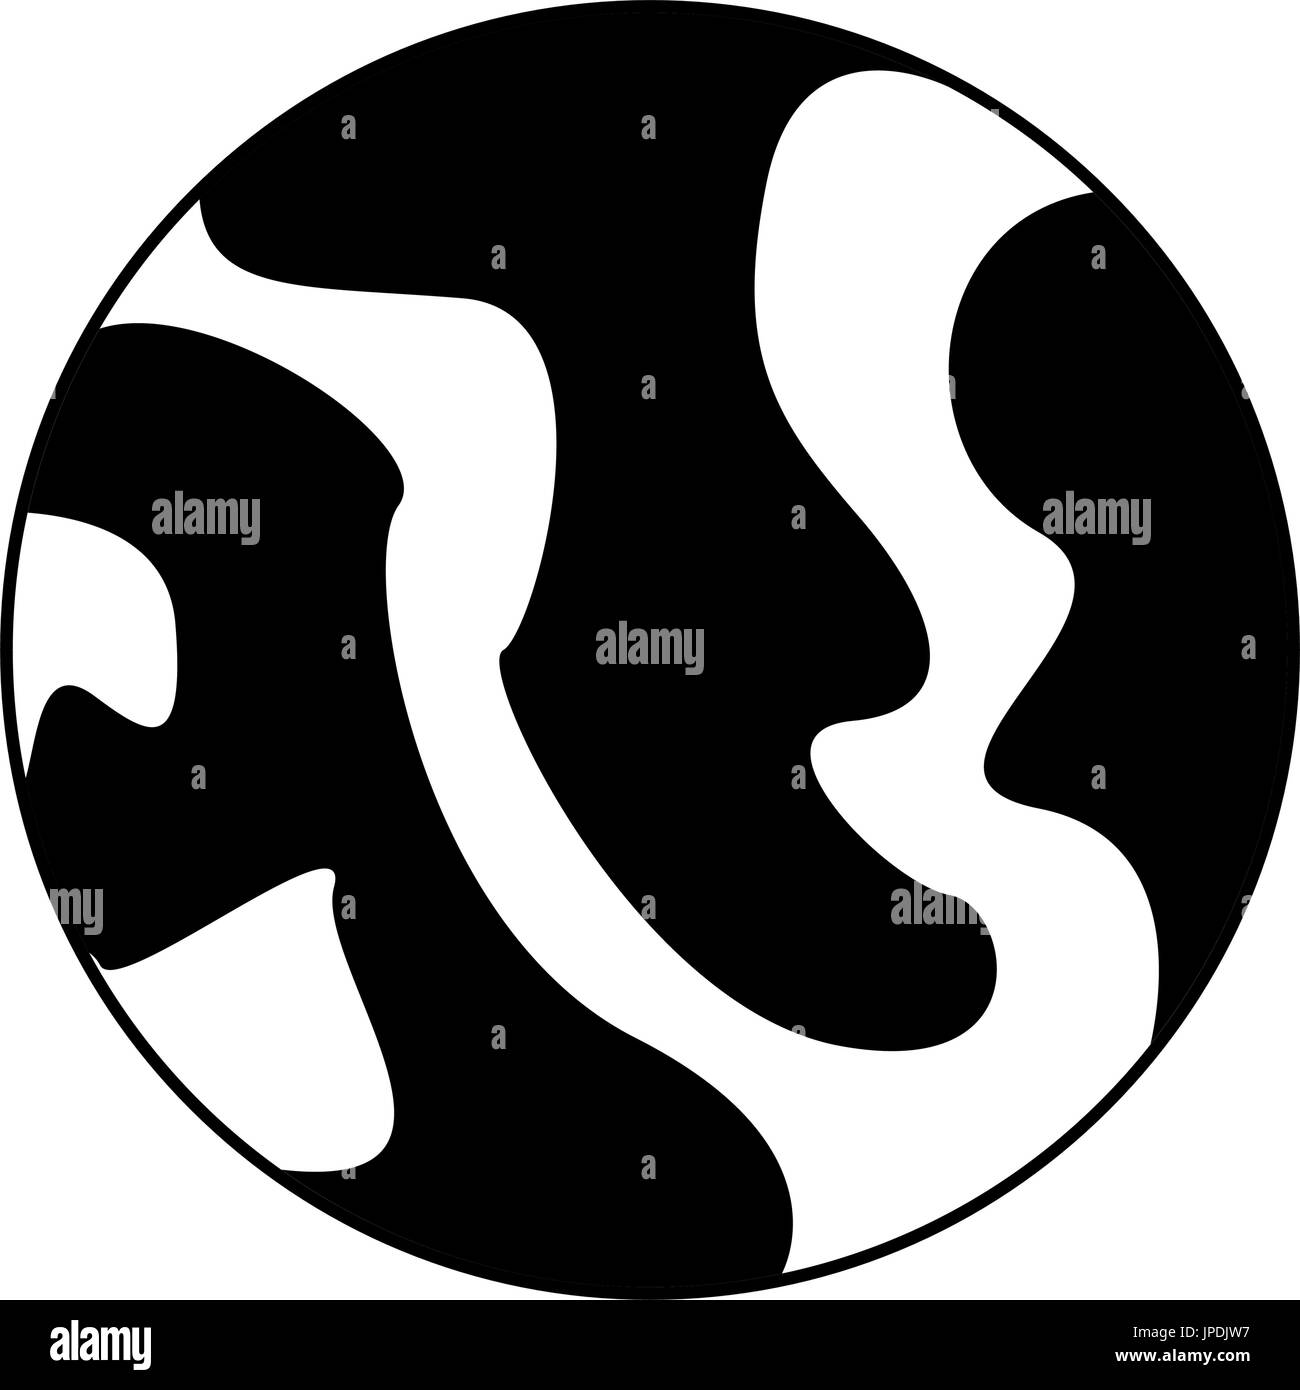 celestial body icon image  - Stock Image